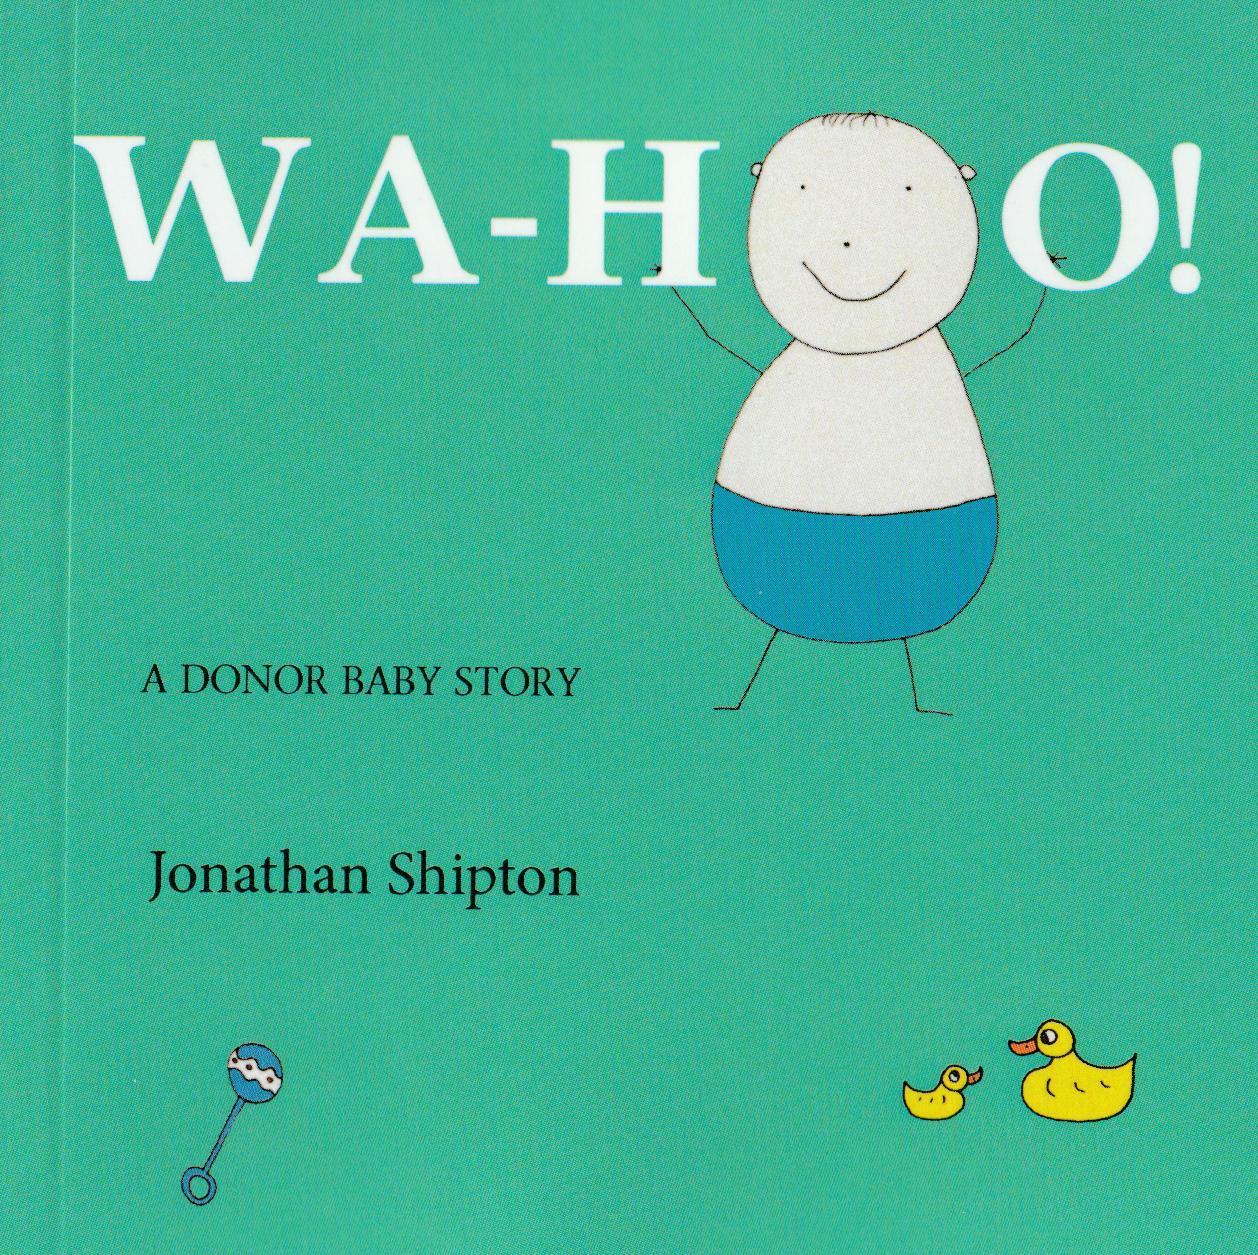 Wa-hoo 1 cover